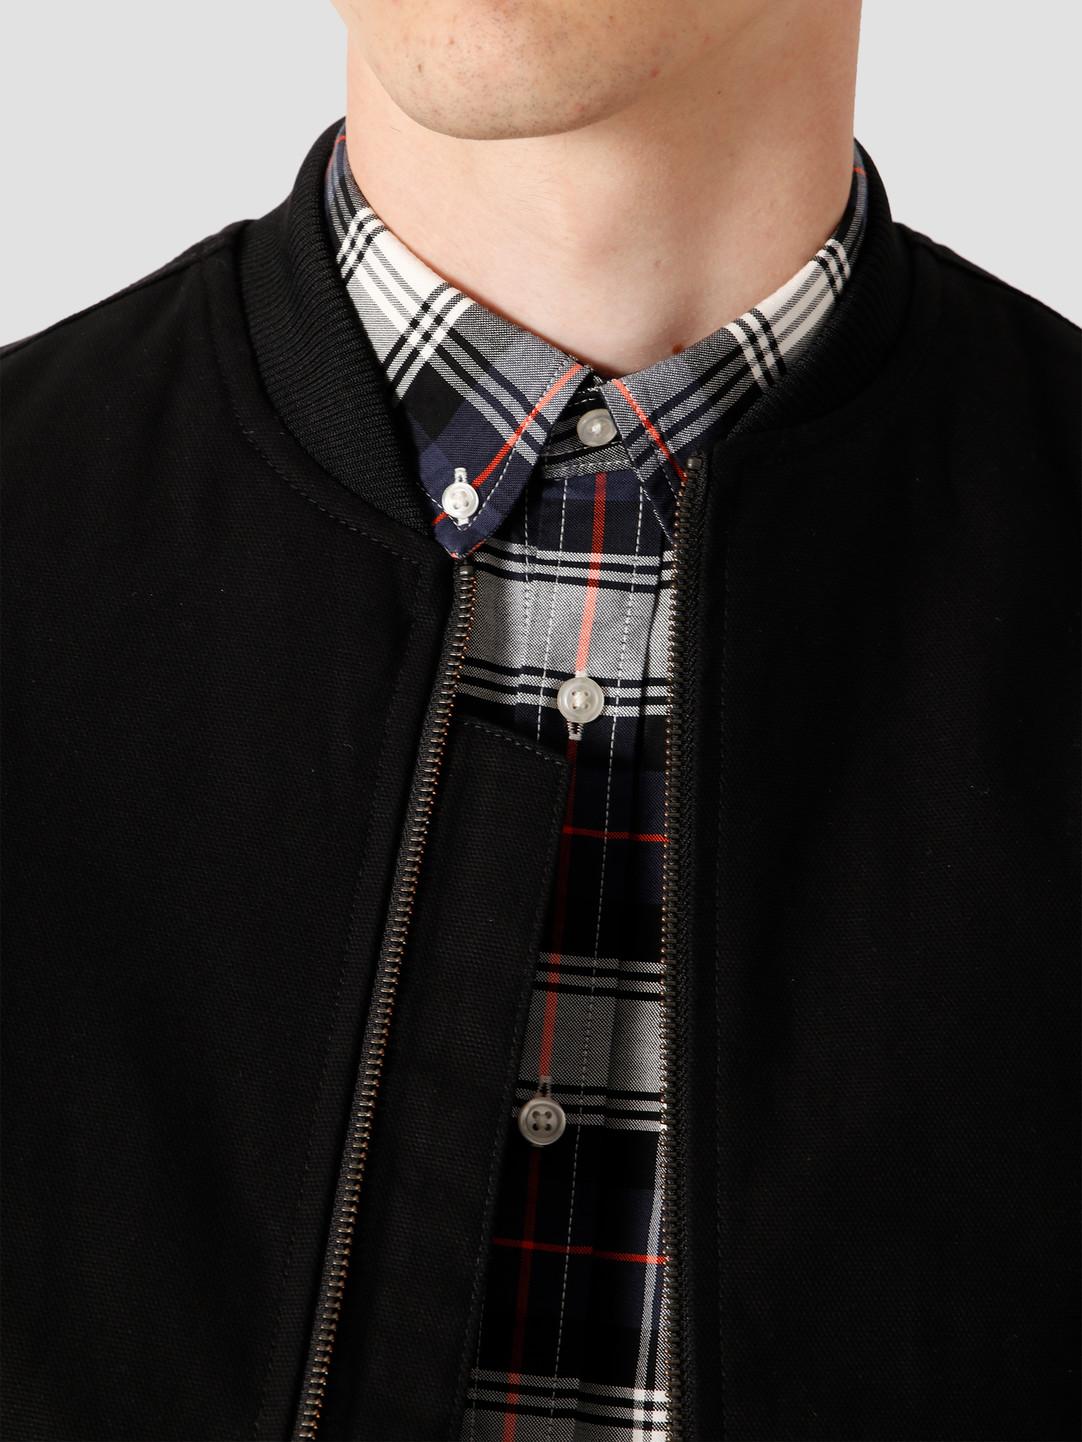 Carhartt WIP Carhartt WIP Vest Black I028423-8901